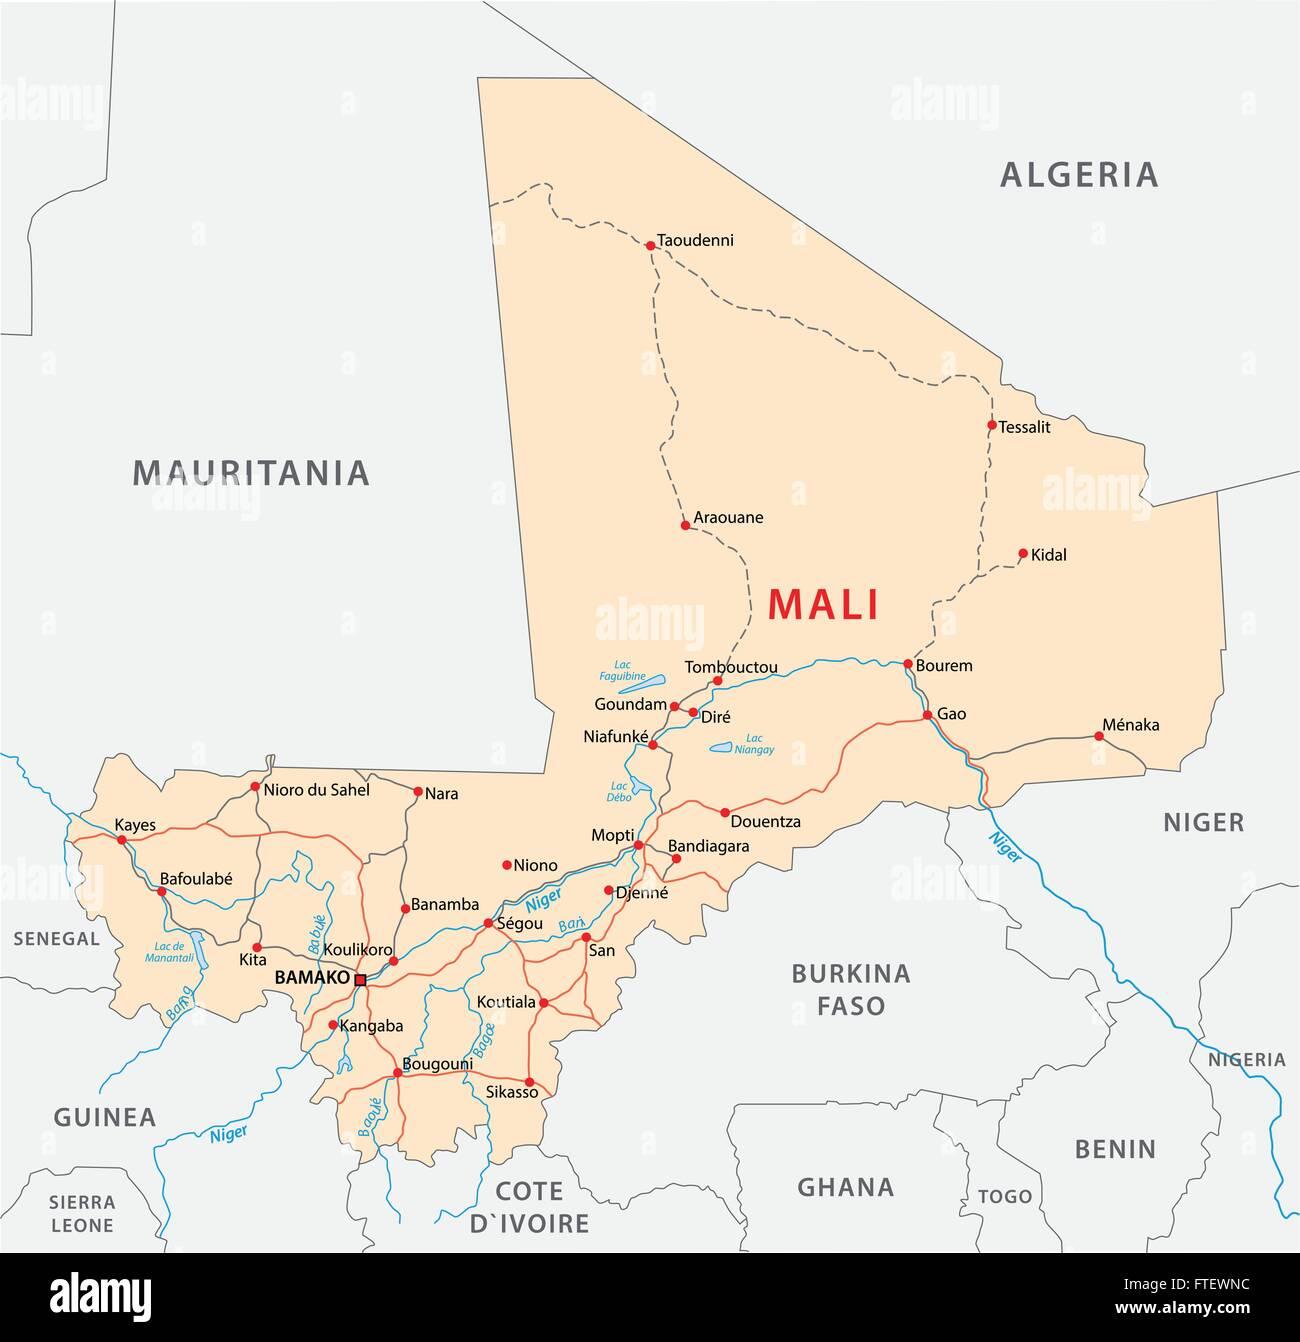 Mali Map Stockfotos & Mali Map Bilder - Alamy